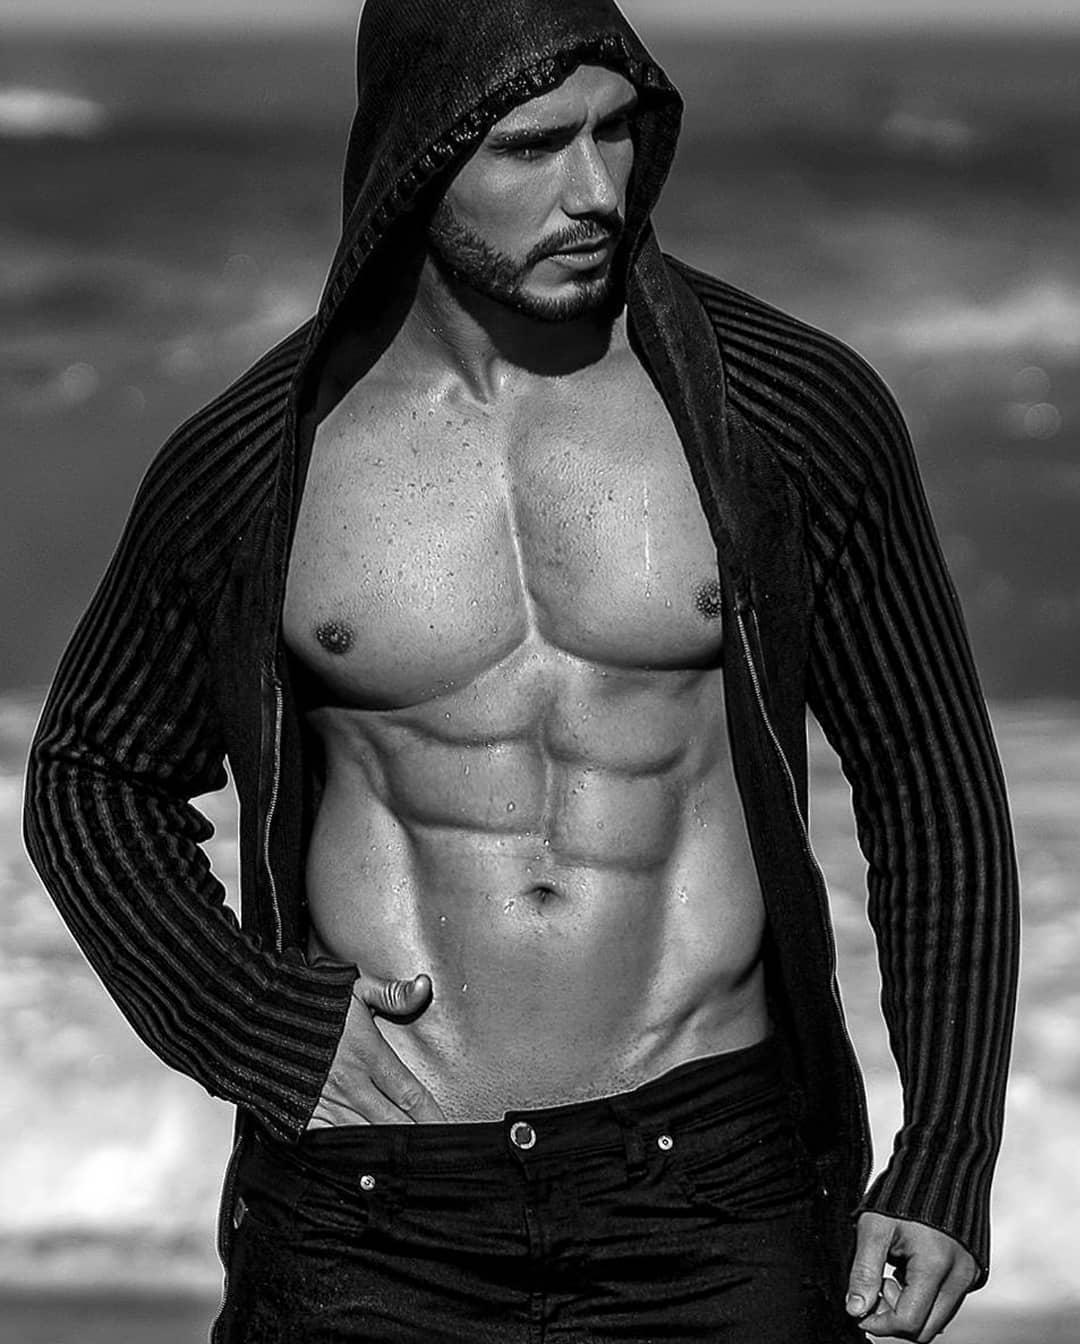 Lucas Viana - @eulucasviana - 887k de seguidores - Fitness/LifeStyle - SP